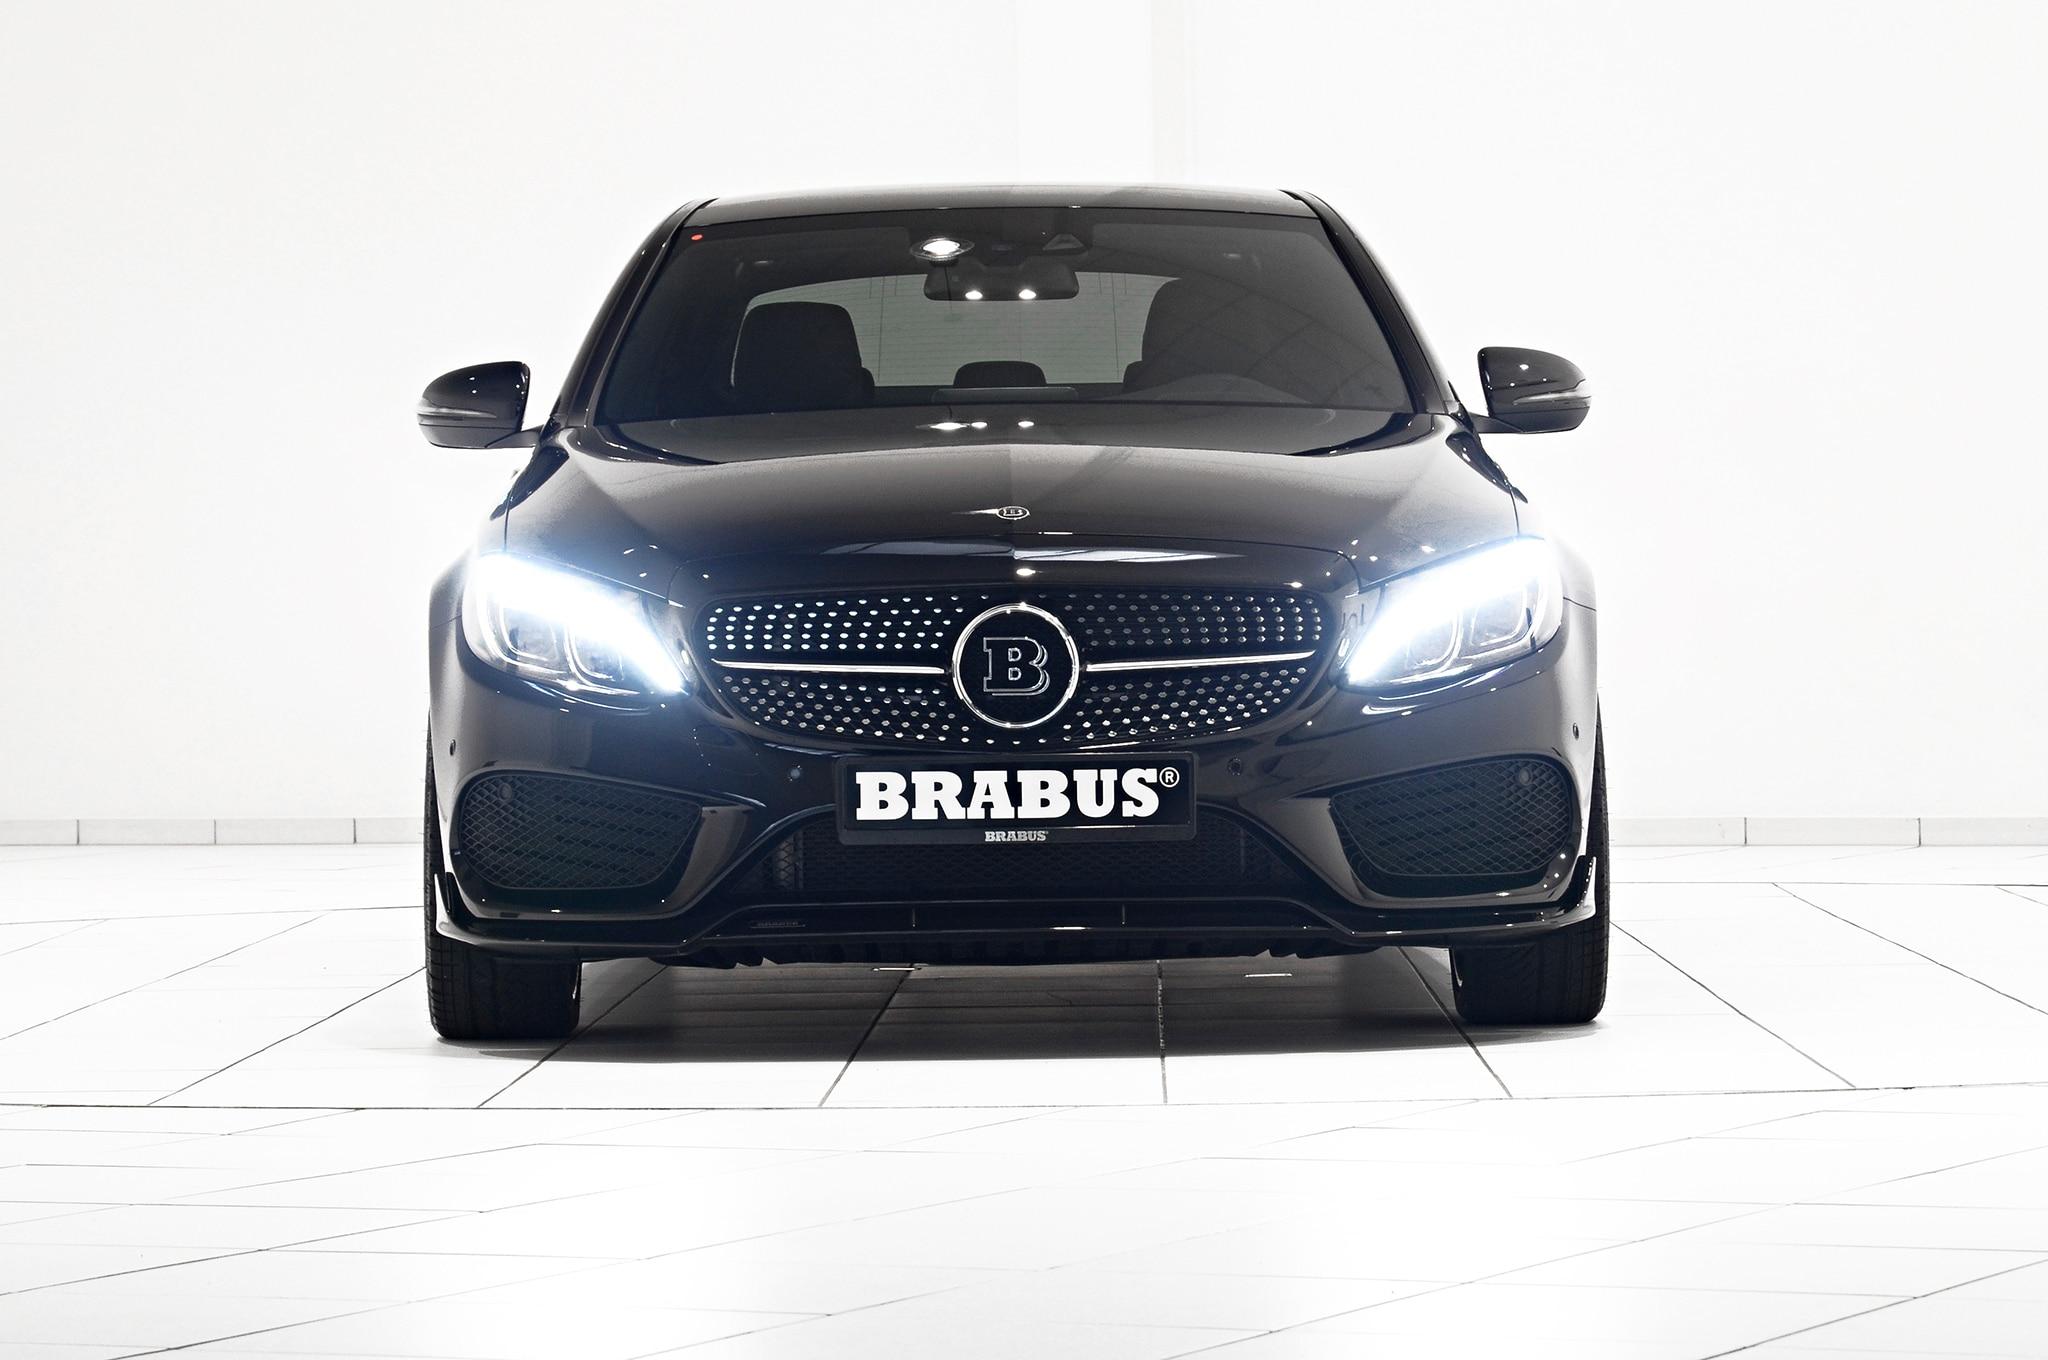 brabus pumps mercedes benz c450 amg up to 405 hp 420 lb ft. Black Bedroom Furniture Sets. Home Design Ideas